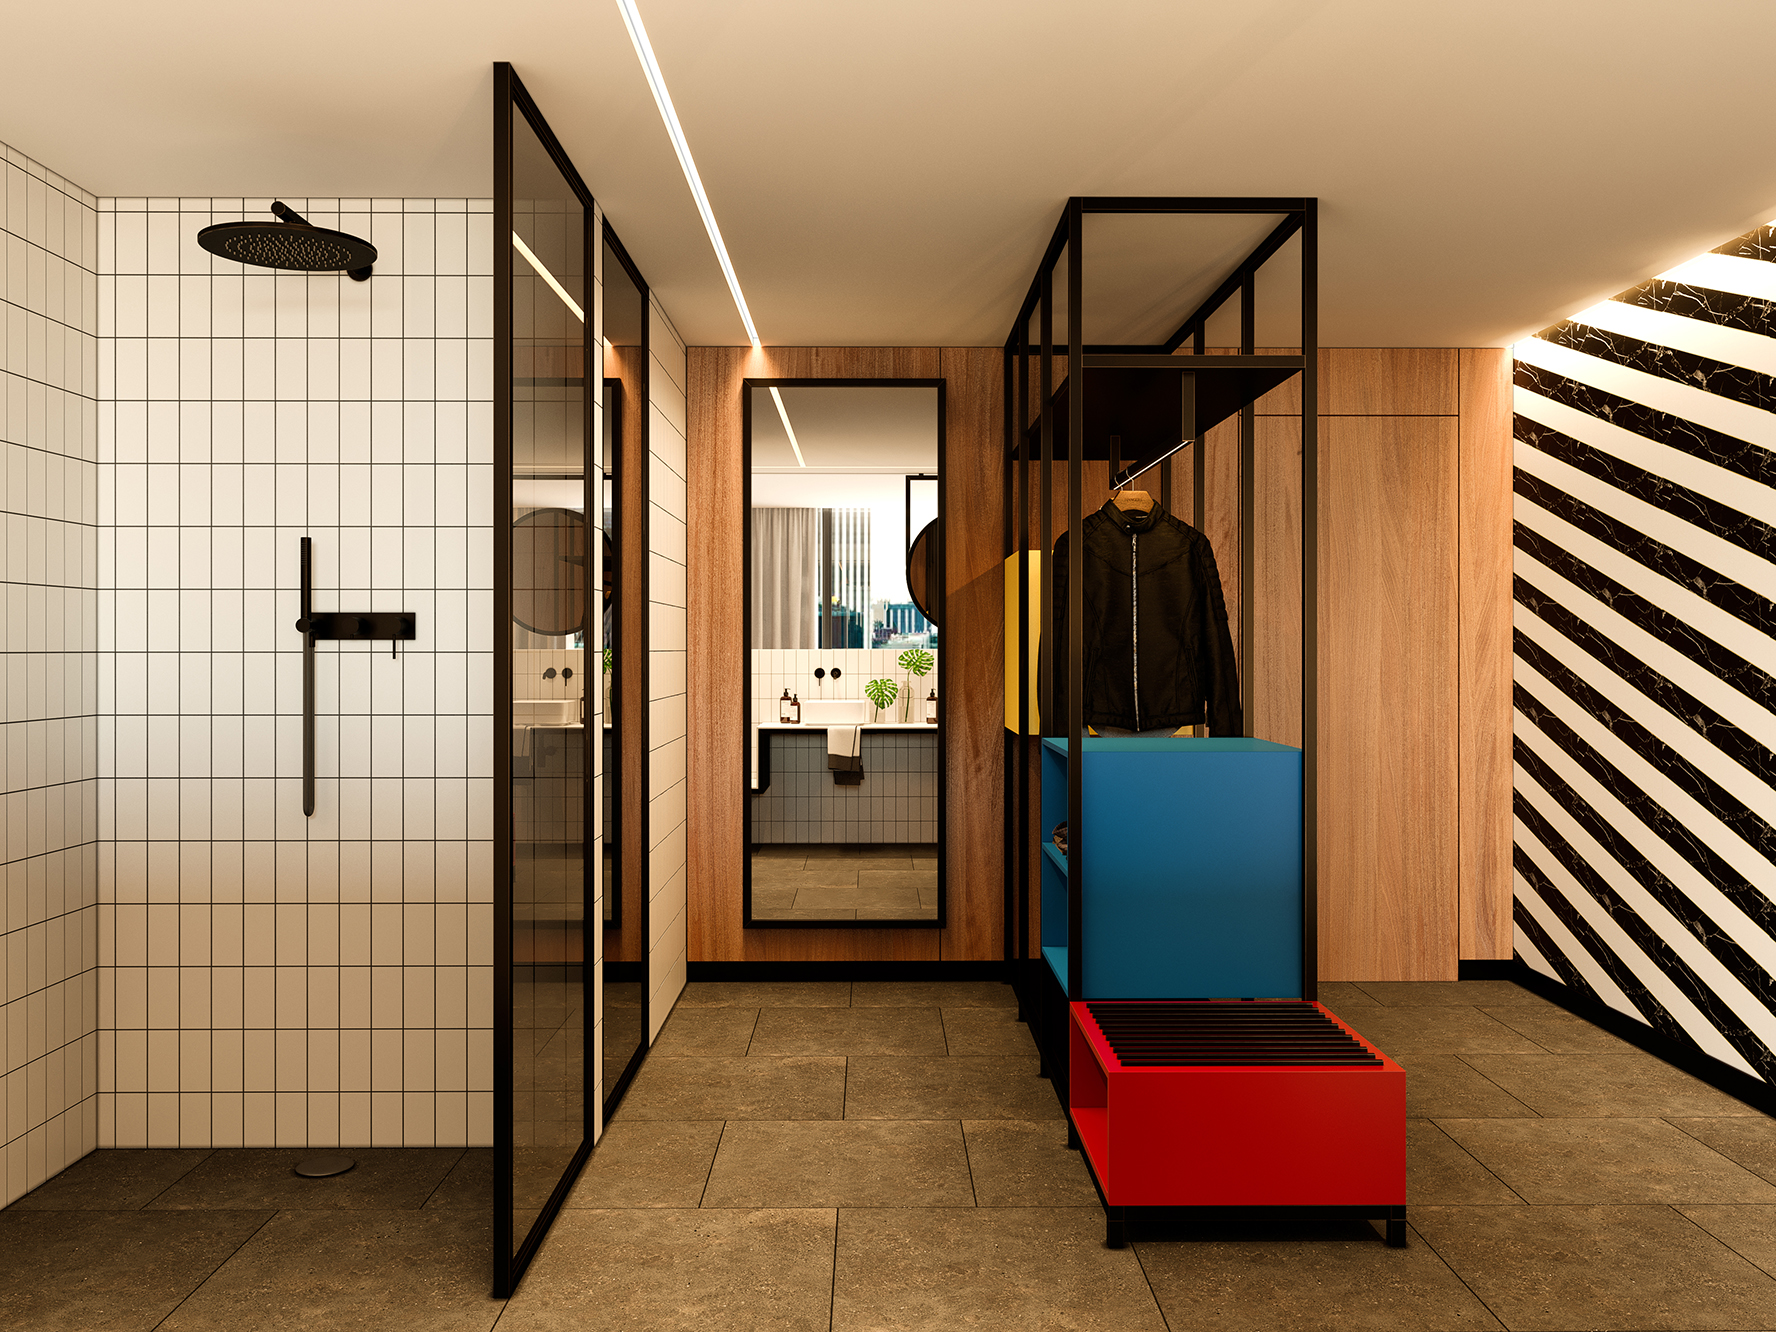 Zag Hotel designed by Moem Studio - Mineheart's Interior Design Awards - Mineheart - Art gallery